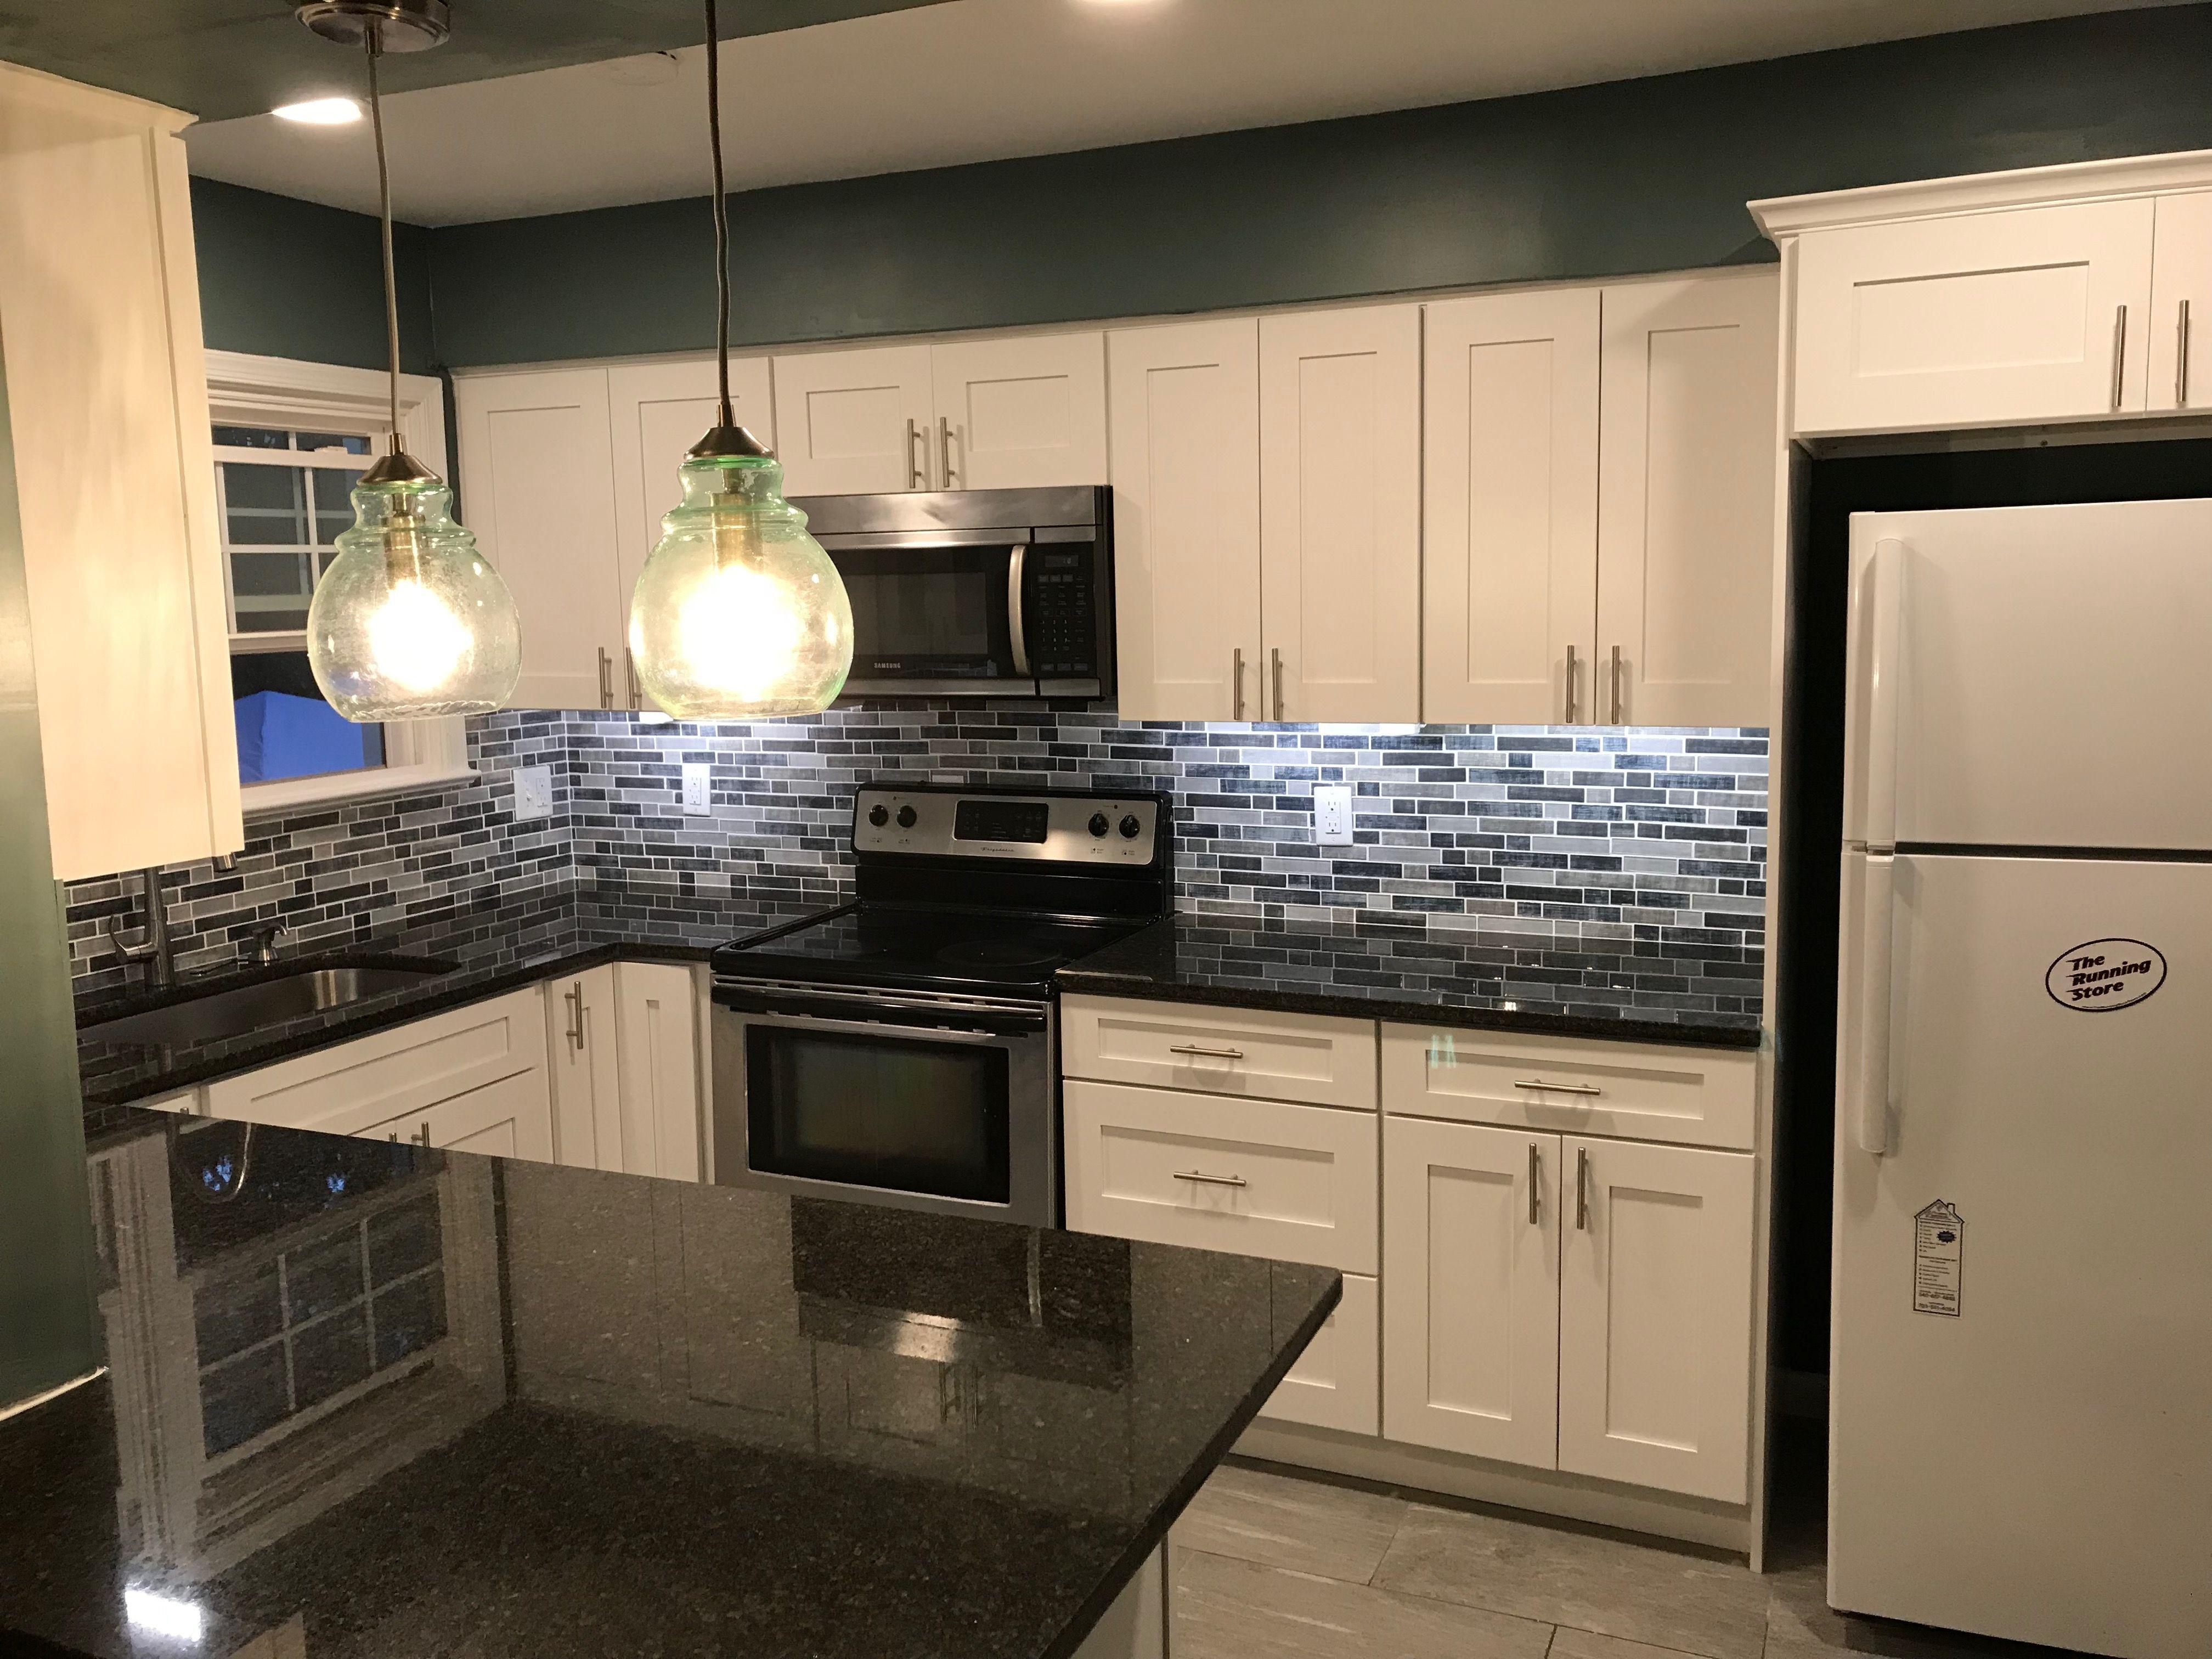 We Create A 3d Design For Your New Kitchen No Surprises Https Atlantictilestone Com Pages Showcase D Kitchen And Bath Remodeling Kitchen Kitchen And Bath